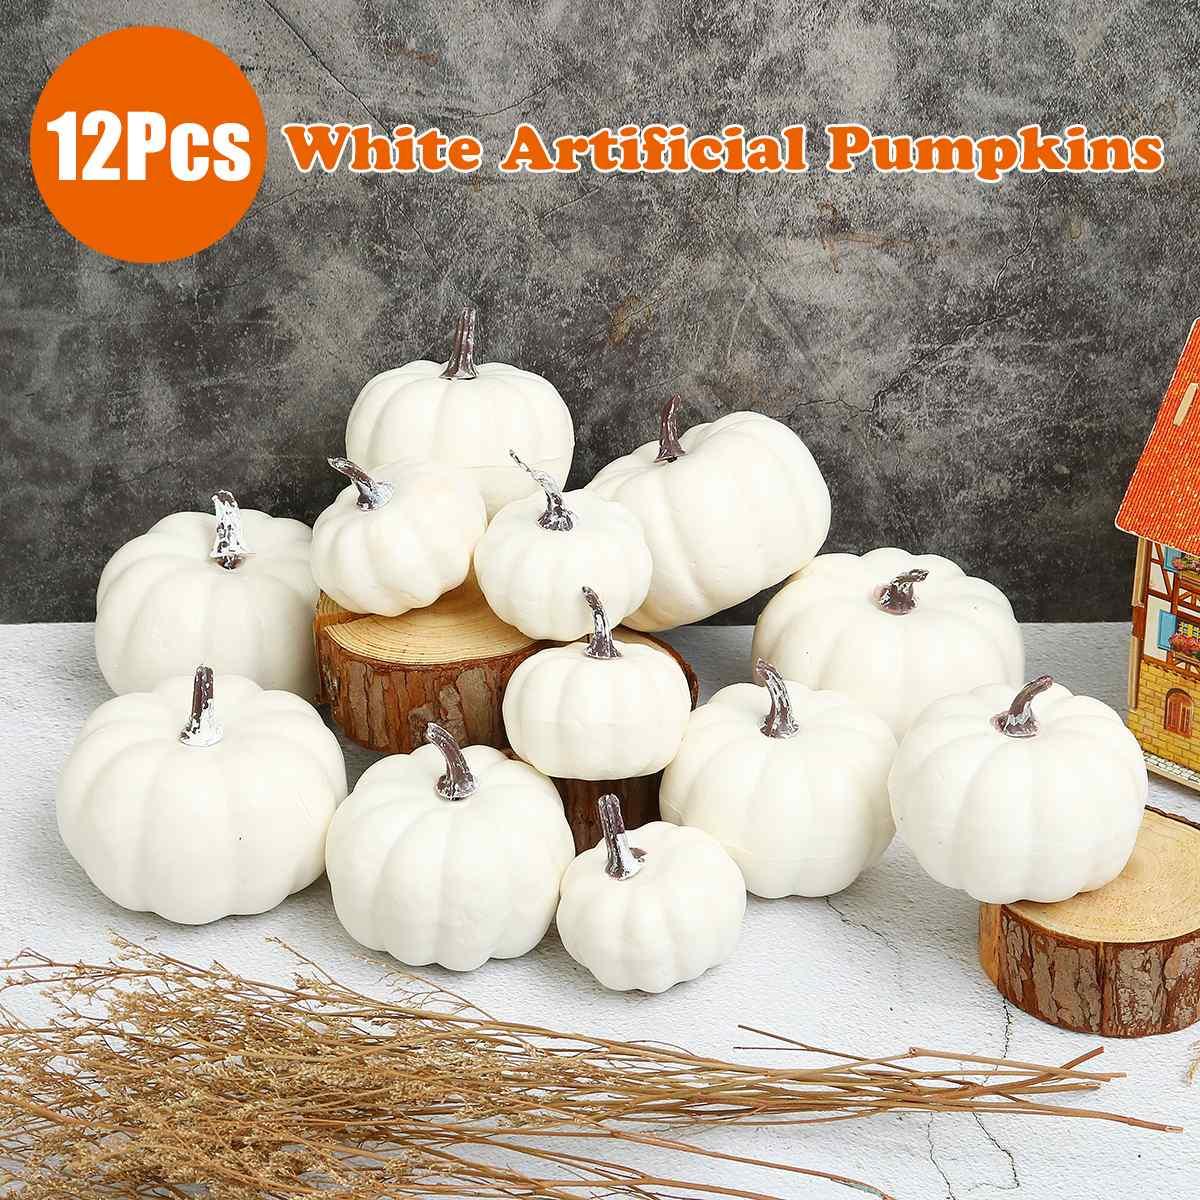 12 Stks/set Diy Nep Fruit Ornament Halloween Wit Kunstmatige Pompoenen Oogst Oogst Thanksgiving Home Decor Props Party